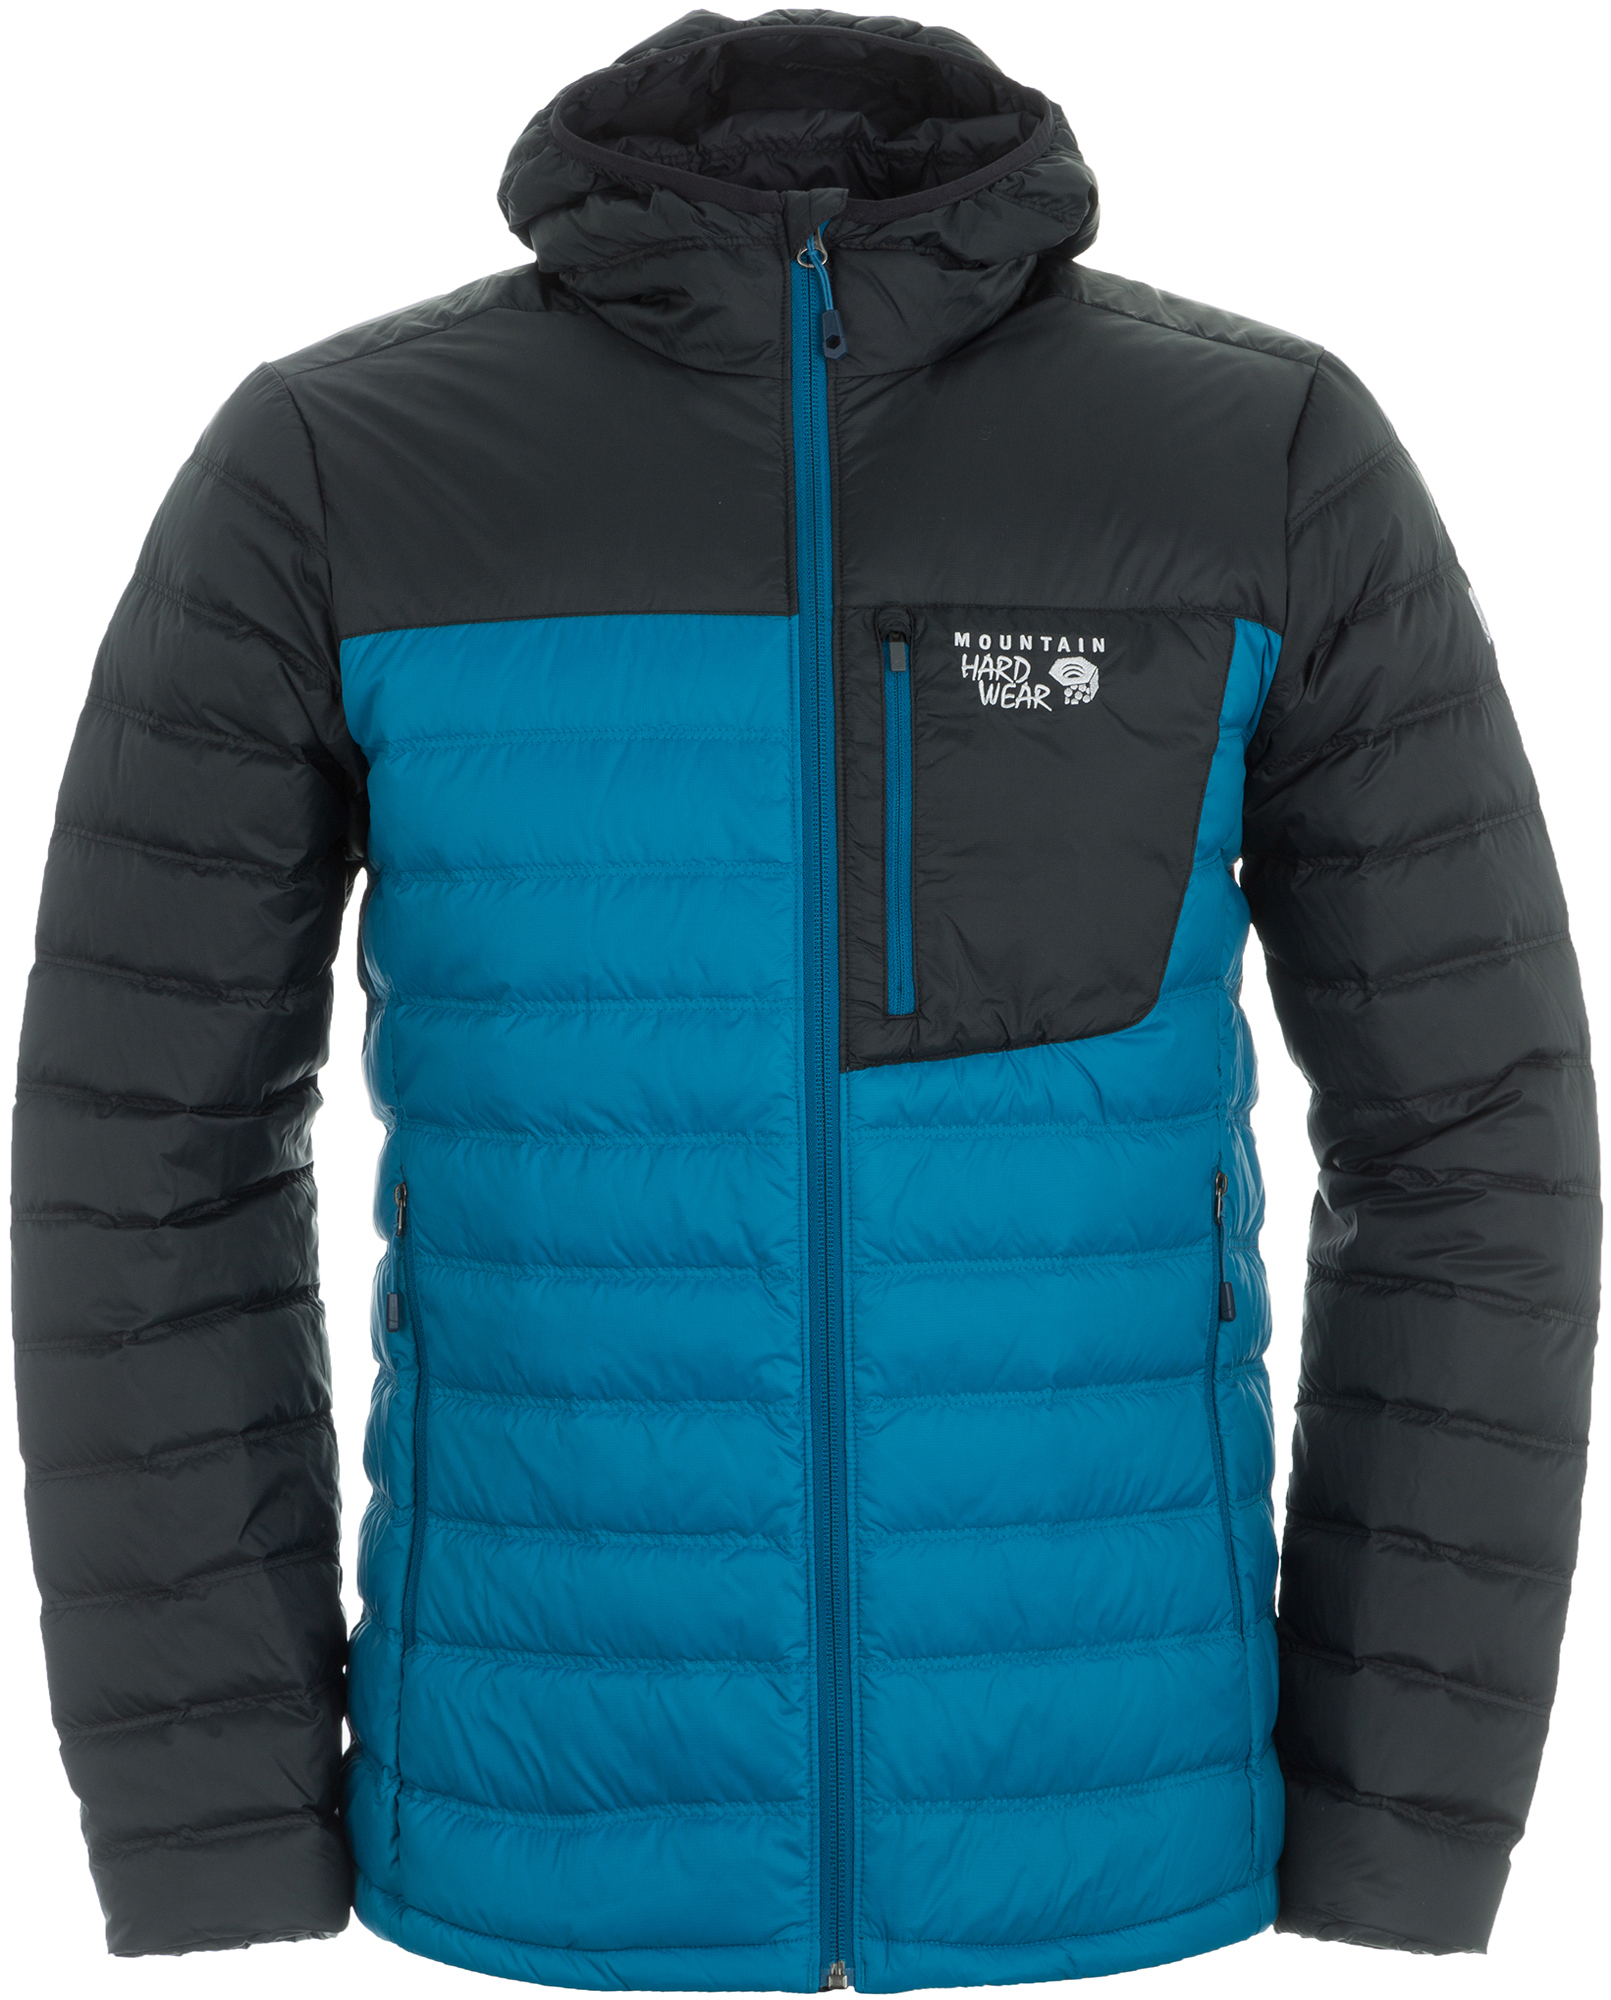 Mountain Hardwear Куртка пуховая мужская Mountain Hardwear Dynotherm, размер 54 r mountain